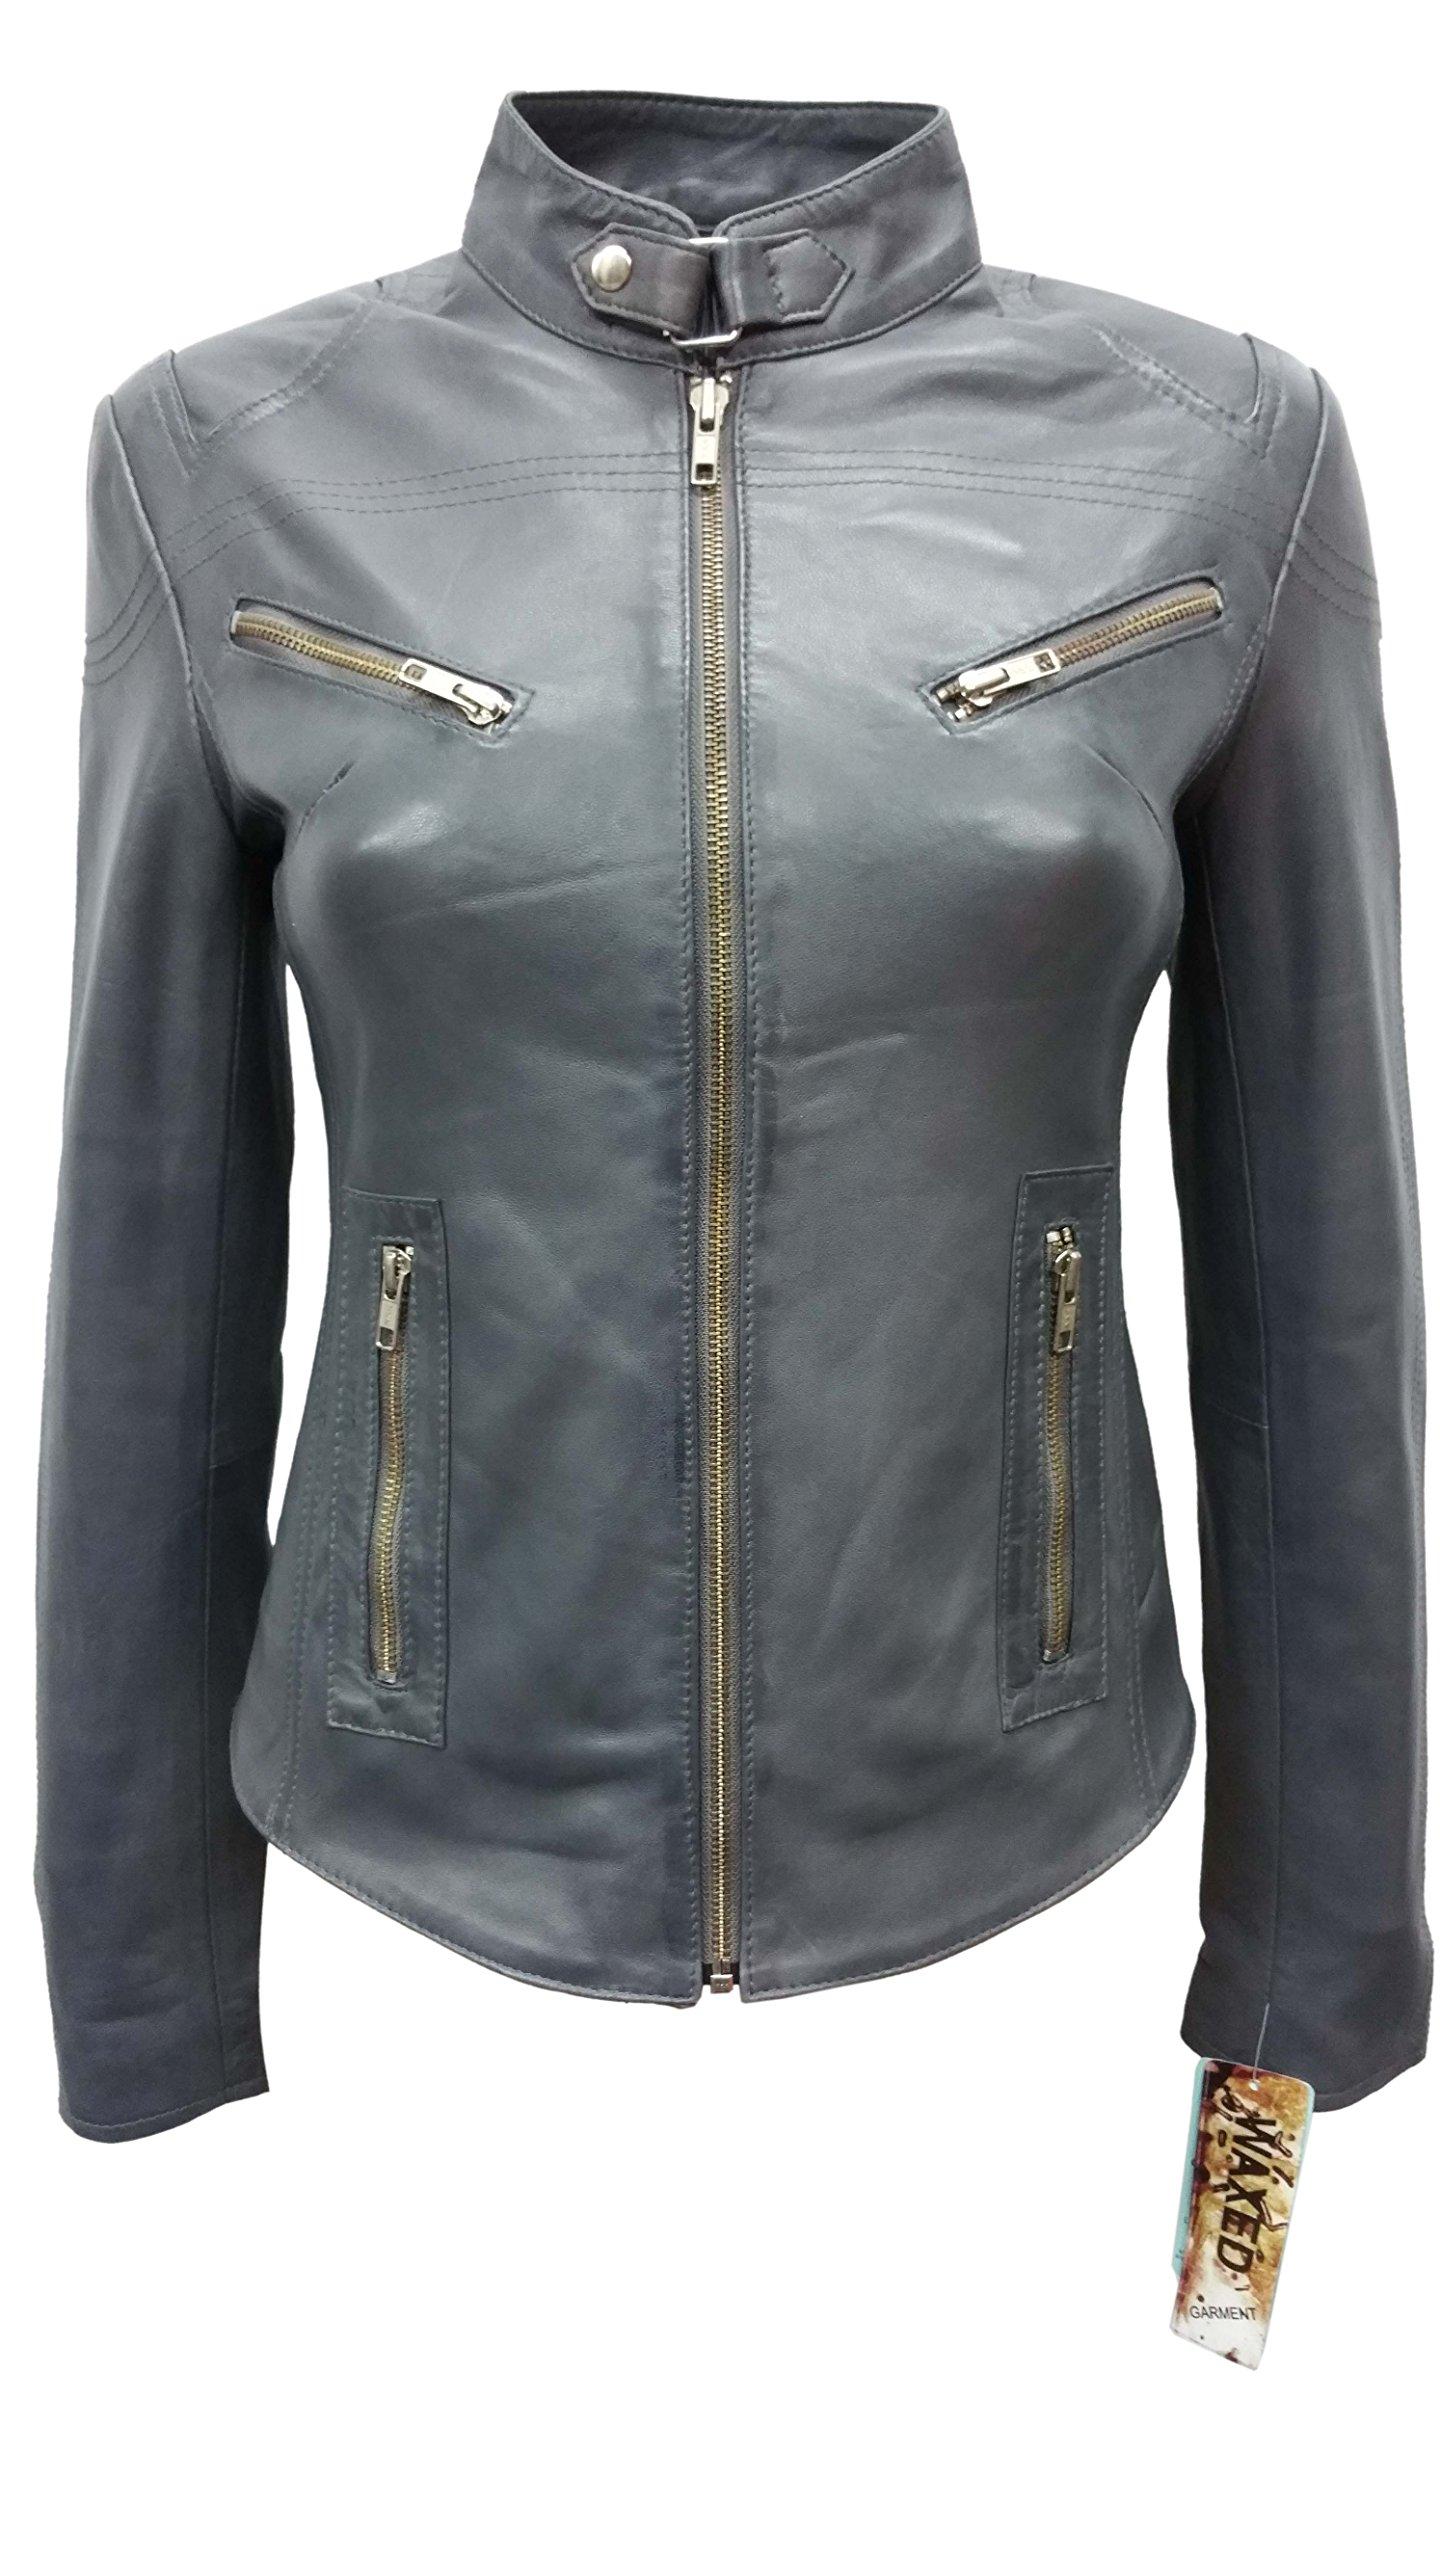 SPEED Ladies Grey Wax Designer Cool Retro Biker Style Motorcycle Leather Jacket (US 8/UK 12)